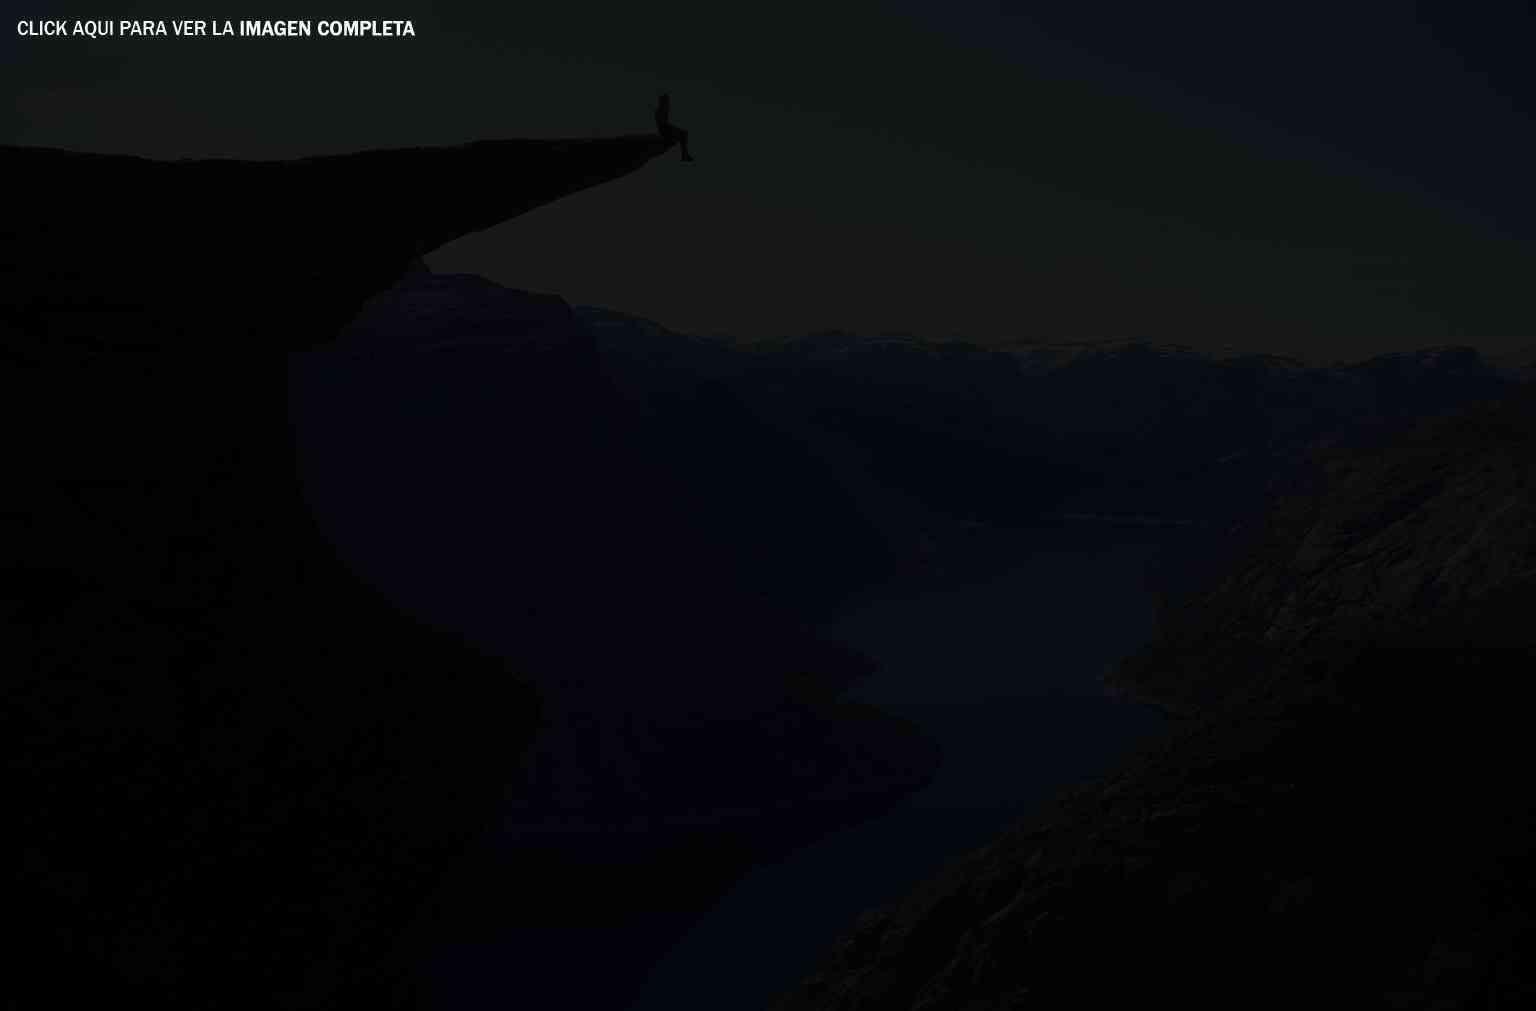 paisajes-increibles-de-la-naturaleza.jpg (1536×1011)